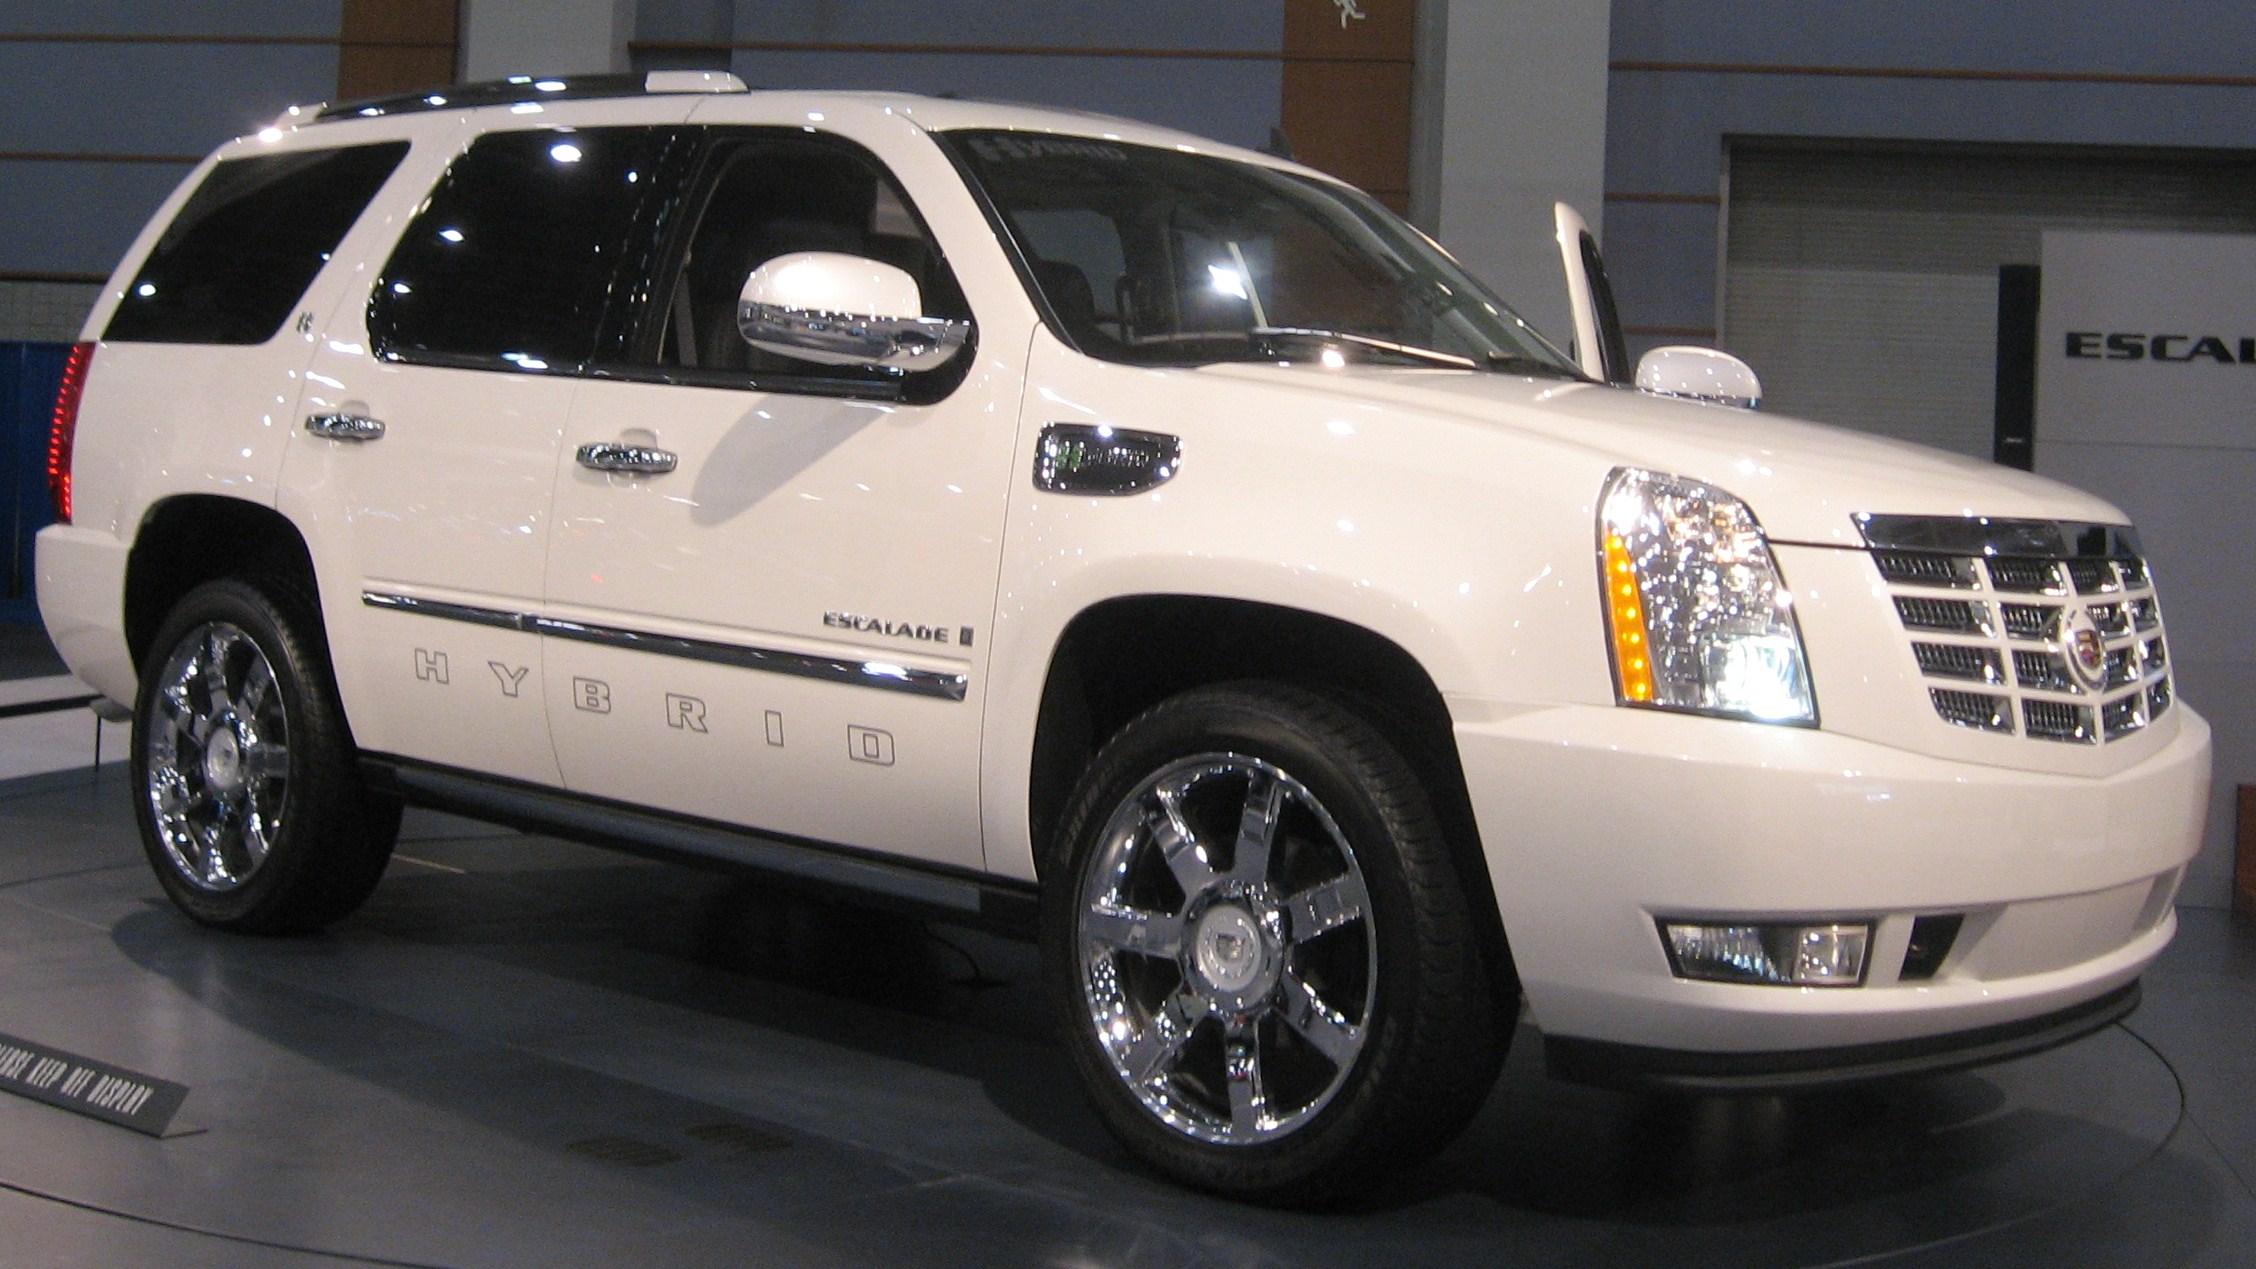 Fichier:Cadillac Escalade Hybrid DC.JPG - Wikipédia